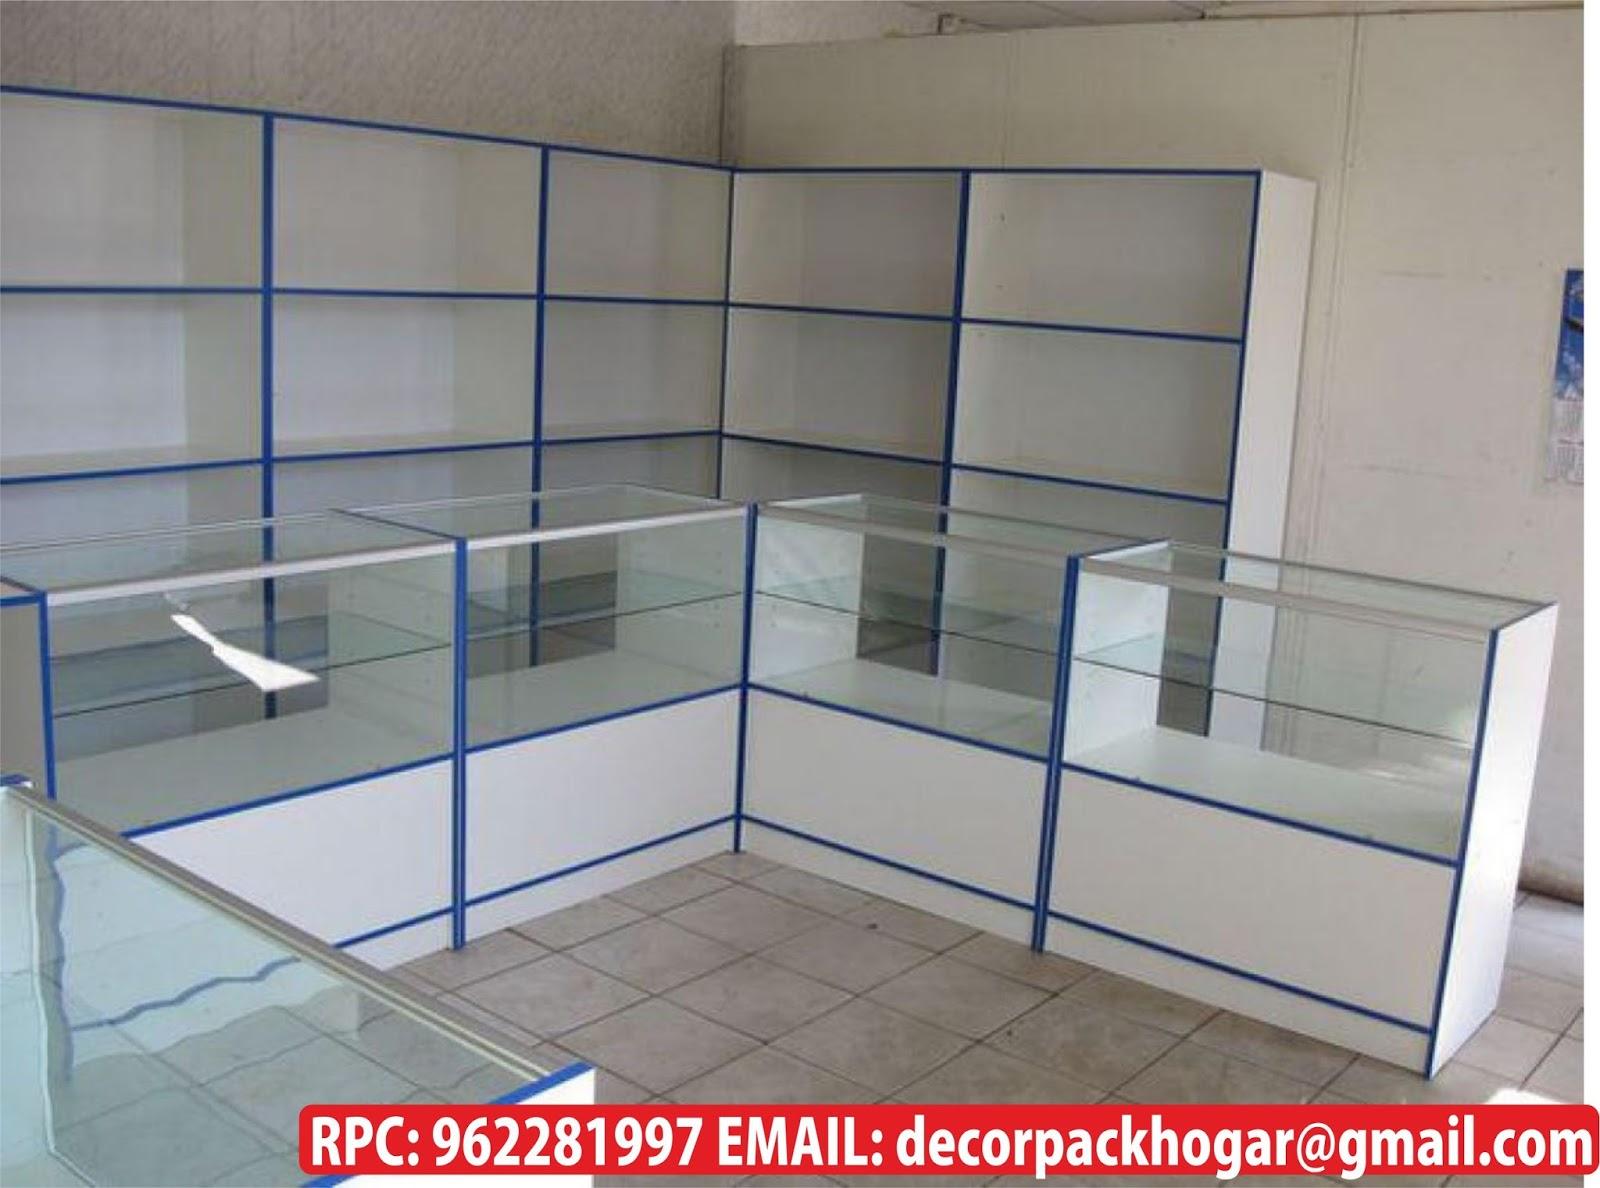 Dise os fabricacion de closet cocina y muebles de oficina - Vitrinas empotradas en pared ...